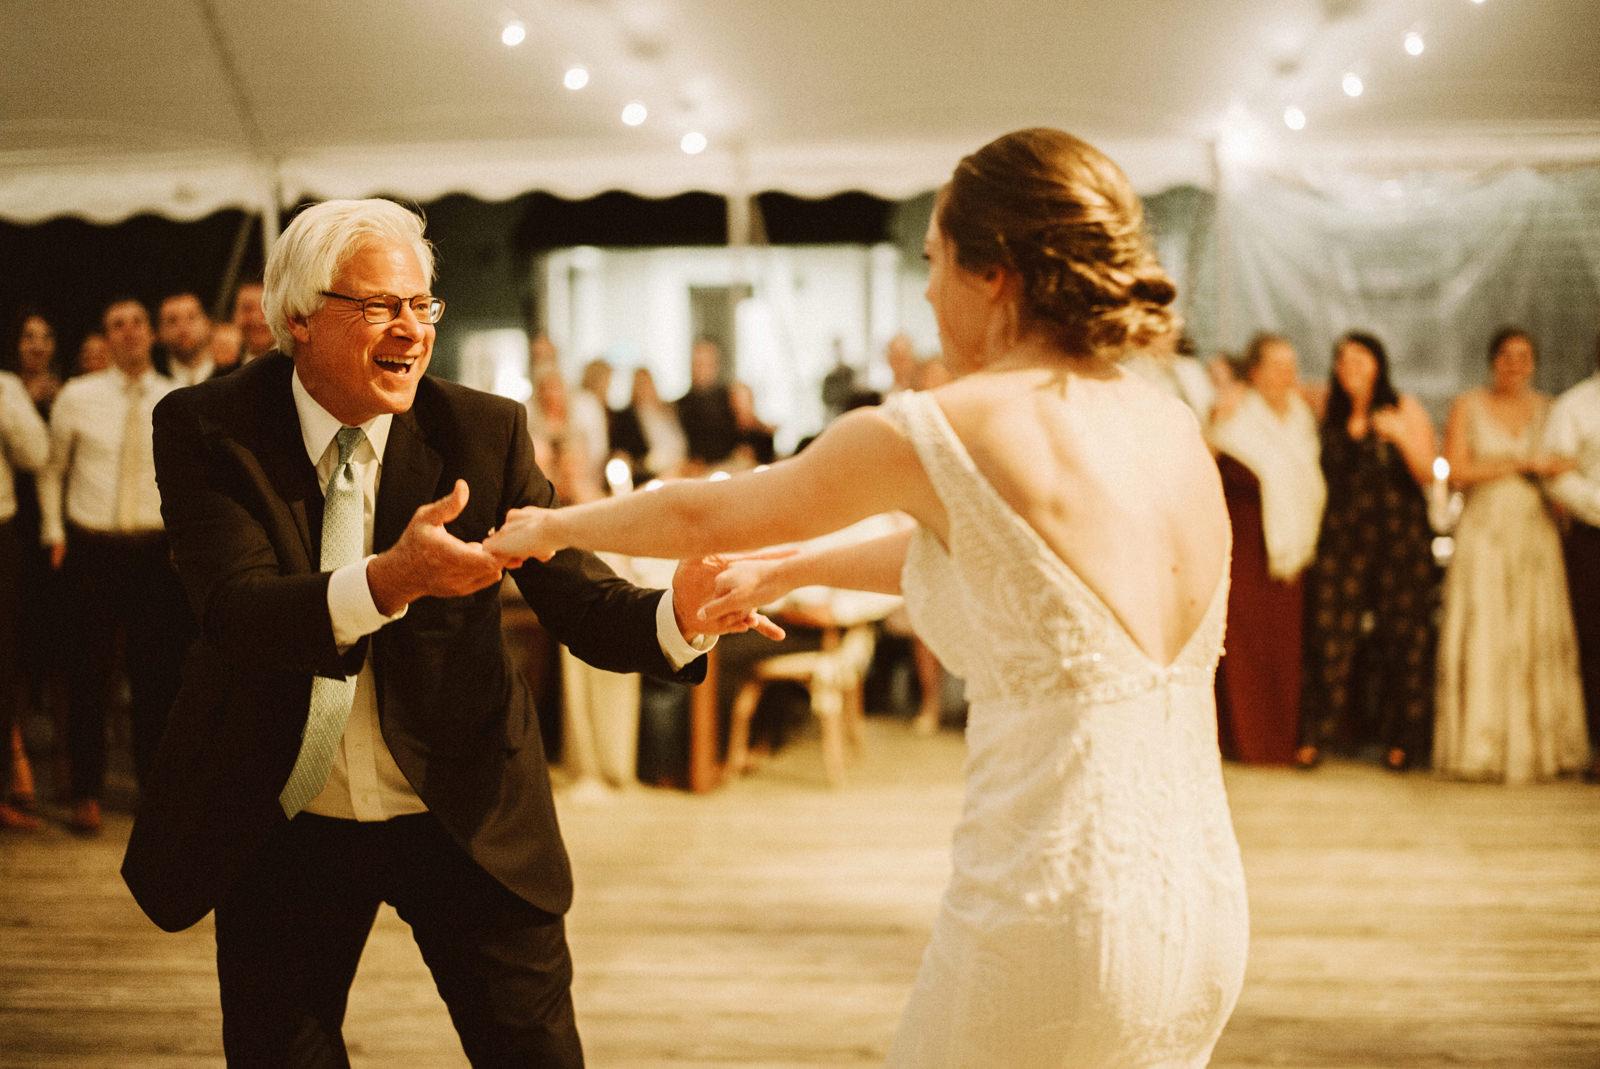 bridgeport-wedding-161 BRIDGEPORT, CONNECTICUT BACKYARD WEDDING